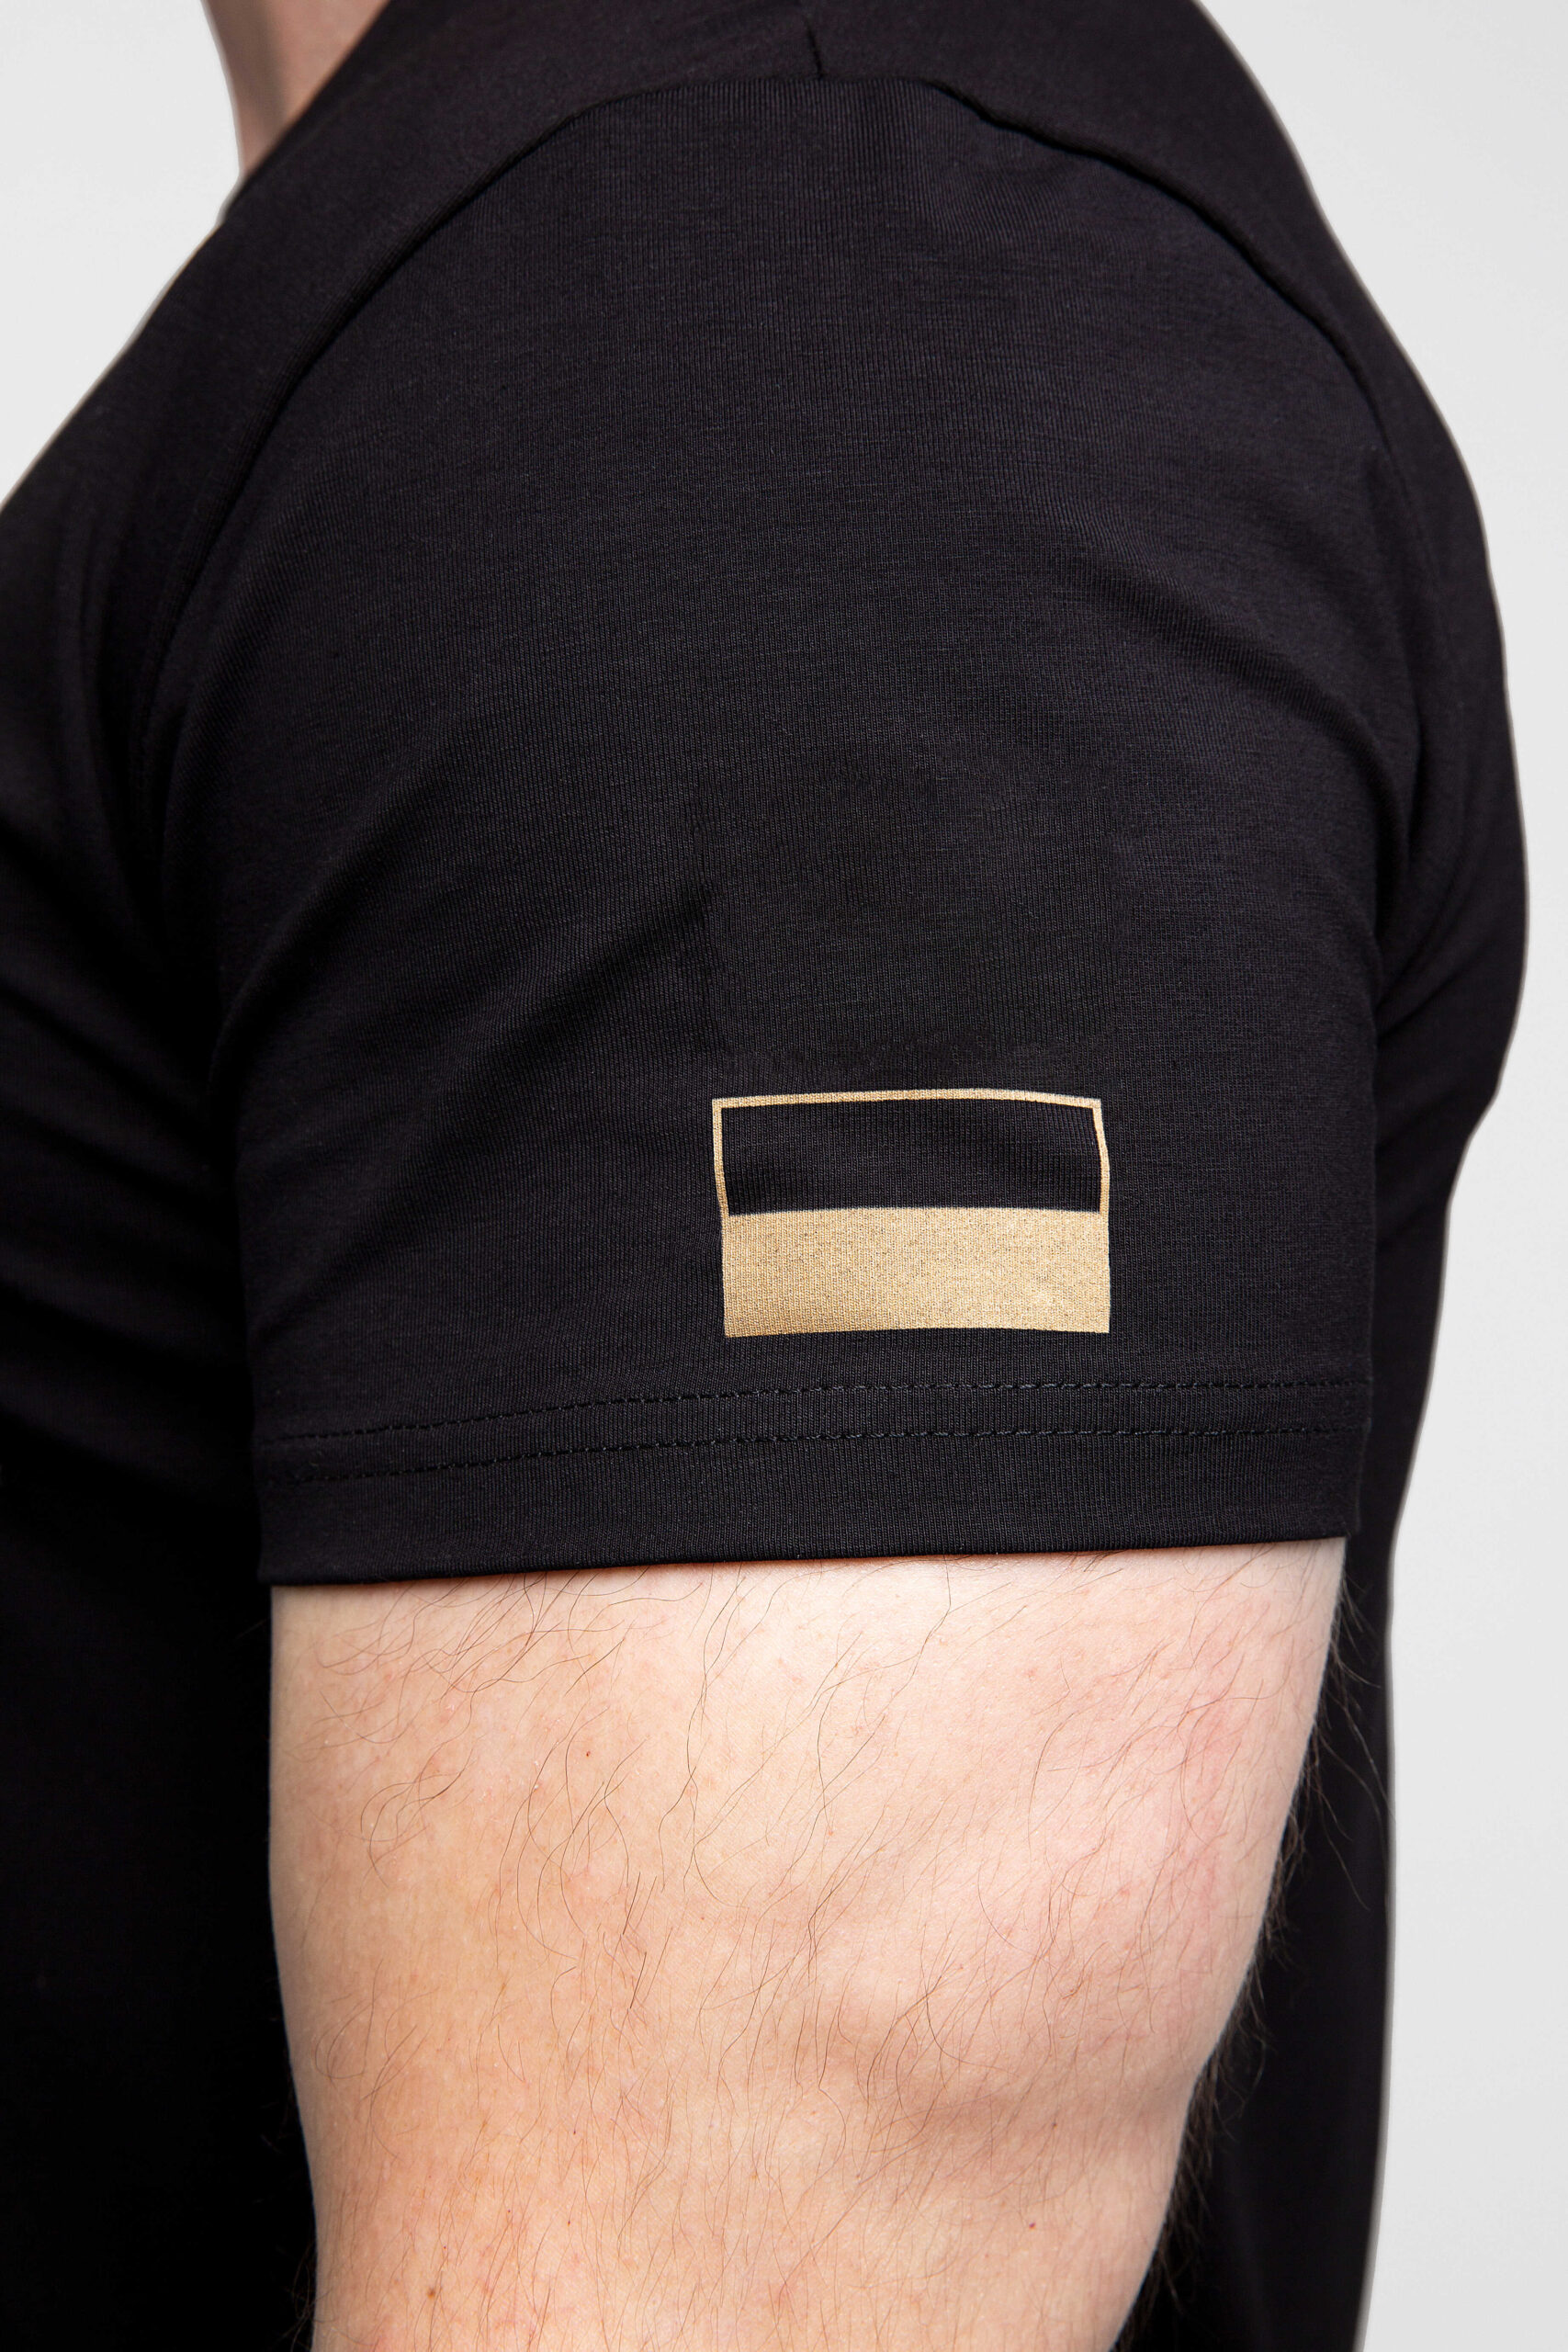 Men's T-Shirt Sahaidachnyi. Color black.  Size worn by the model: L.